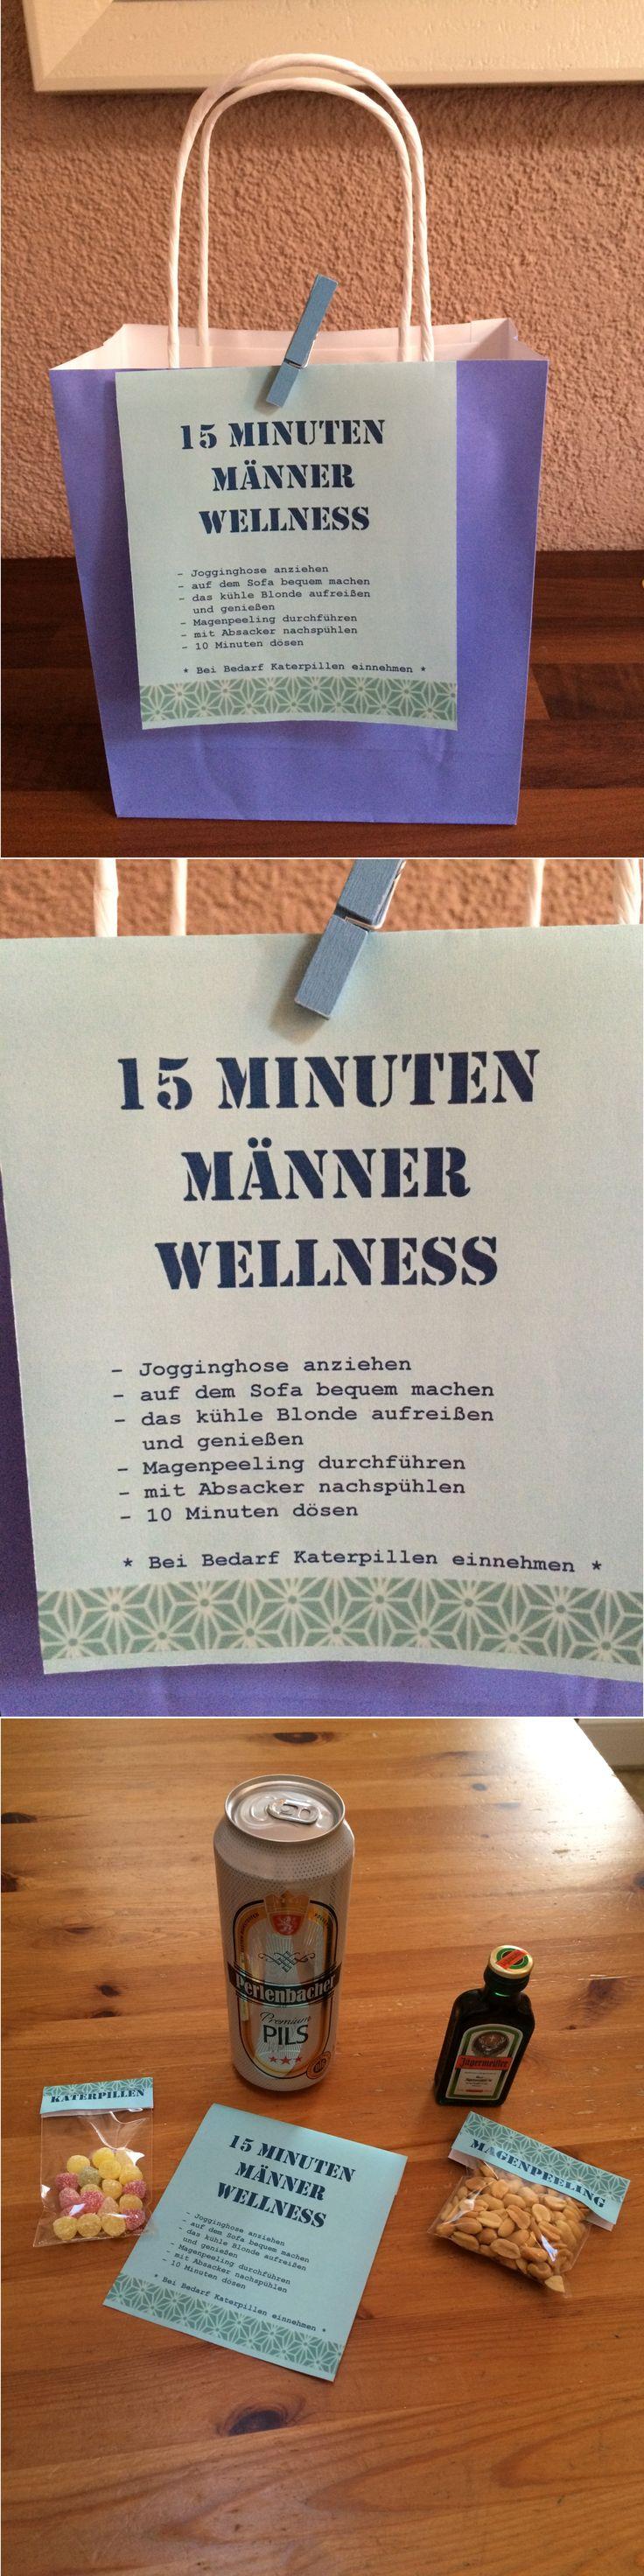 15 Minuten Männer Wellness!!! Geschenkidee für den Mann